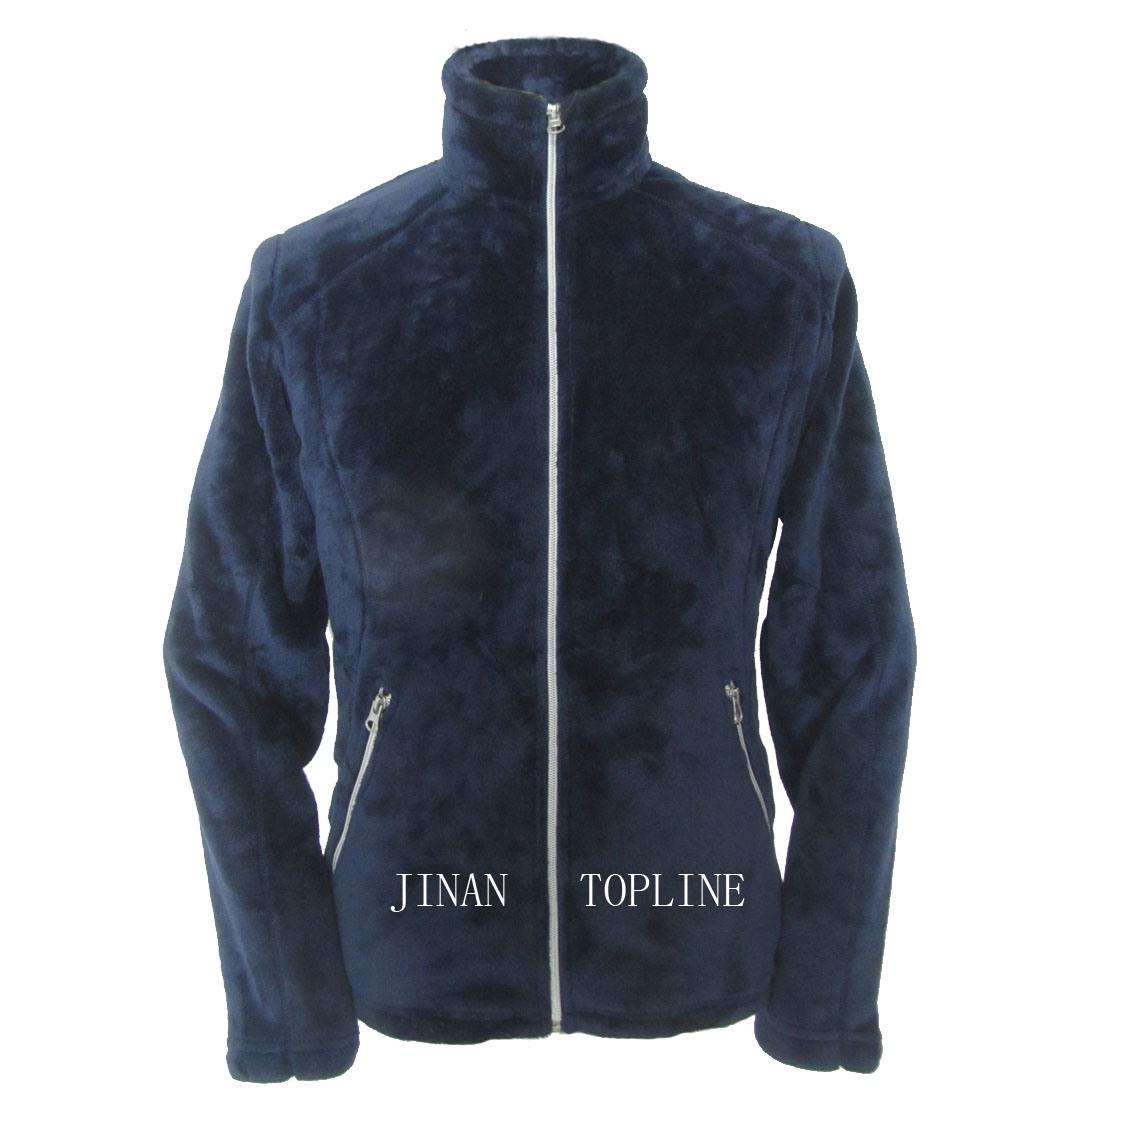 Ladies Fashion Fake/Faux Fur Thermal Casual Jacket